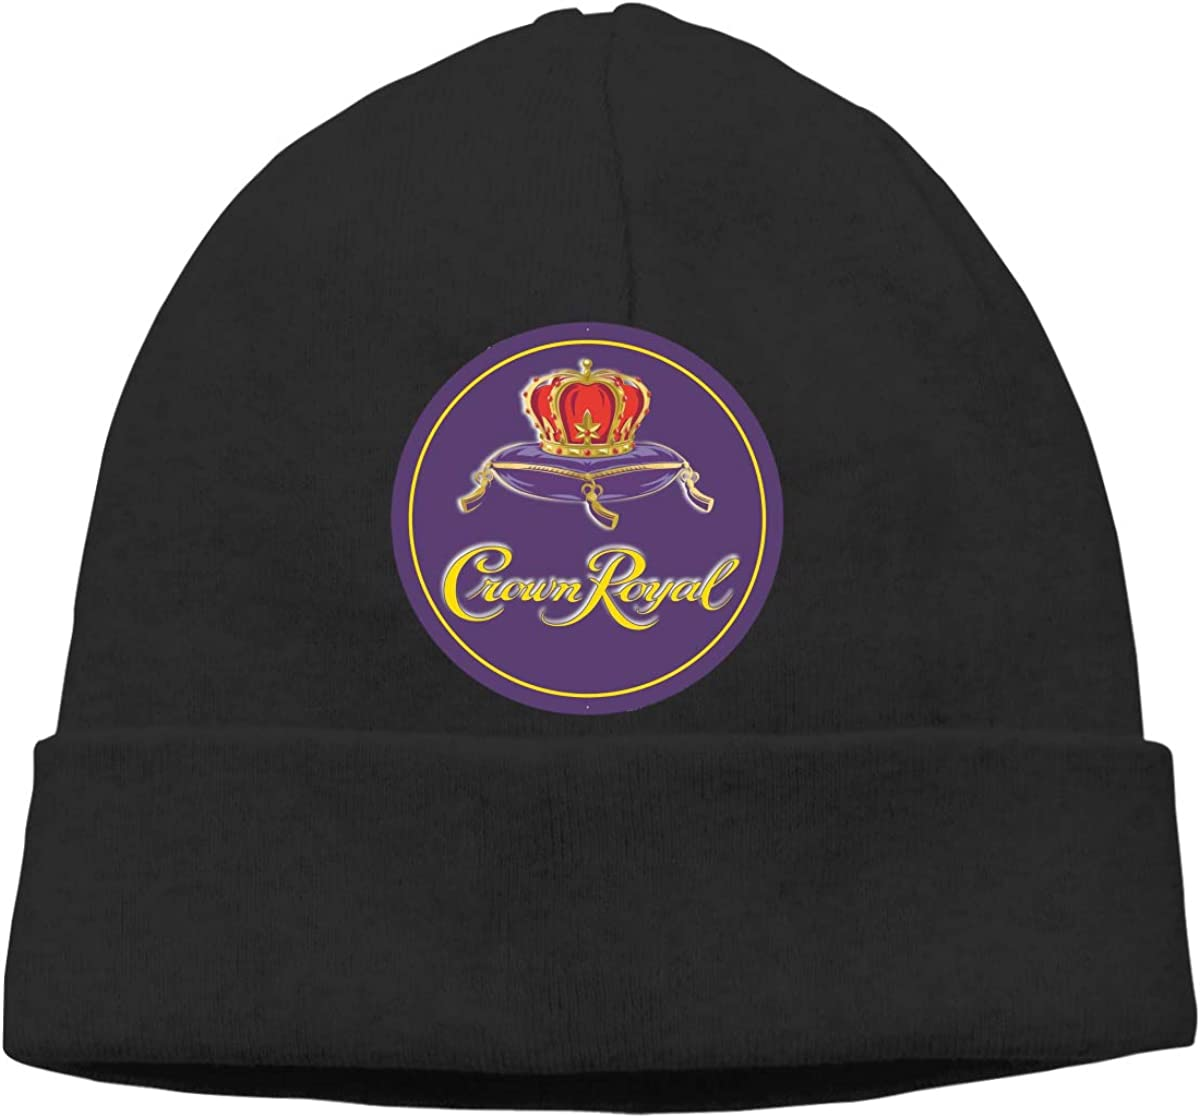 Sppeuio Crown Royal Hat Stylish